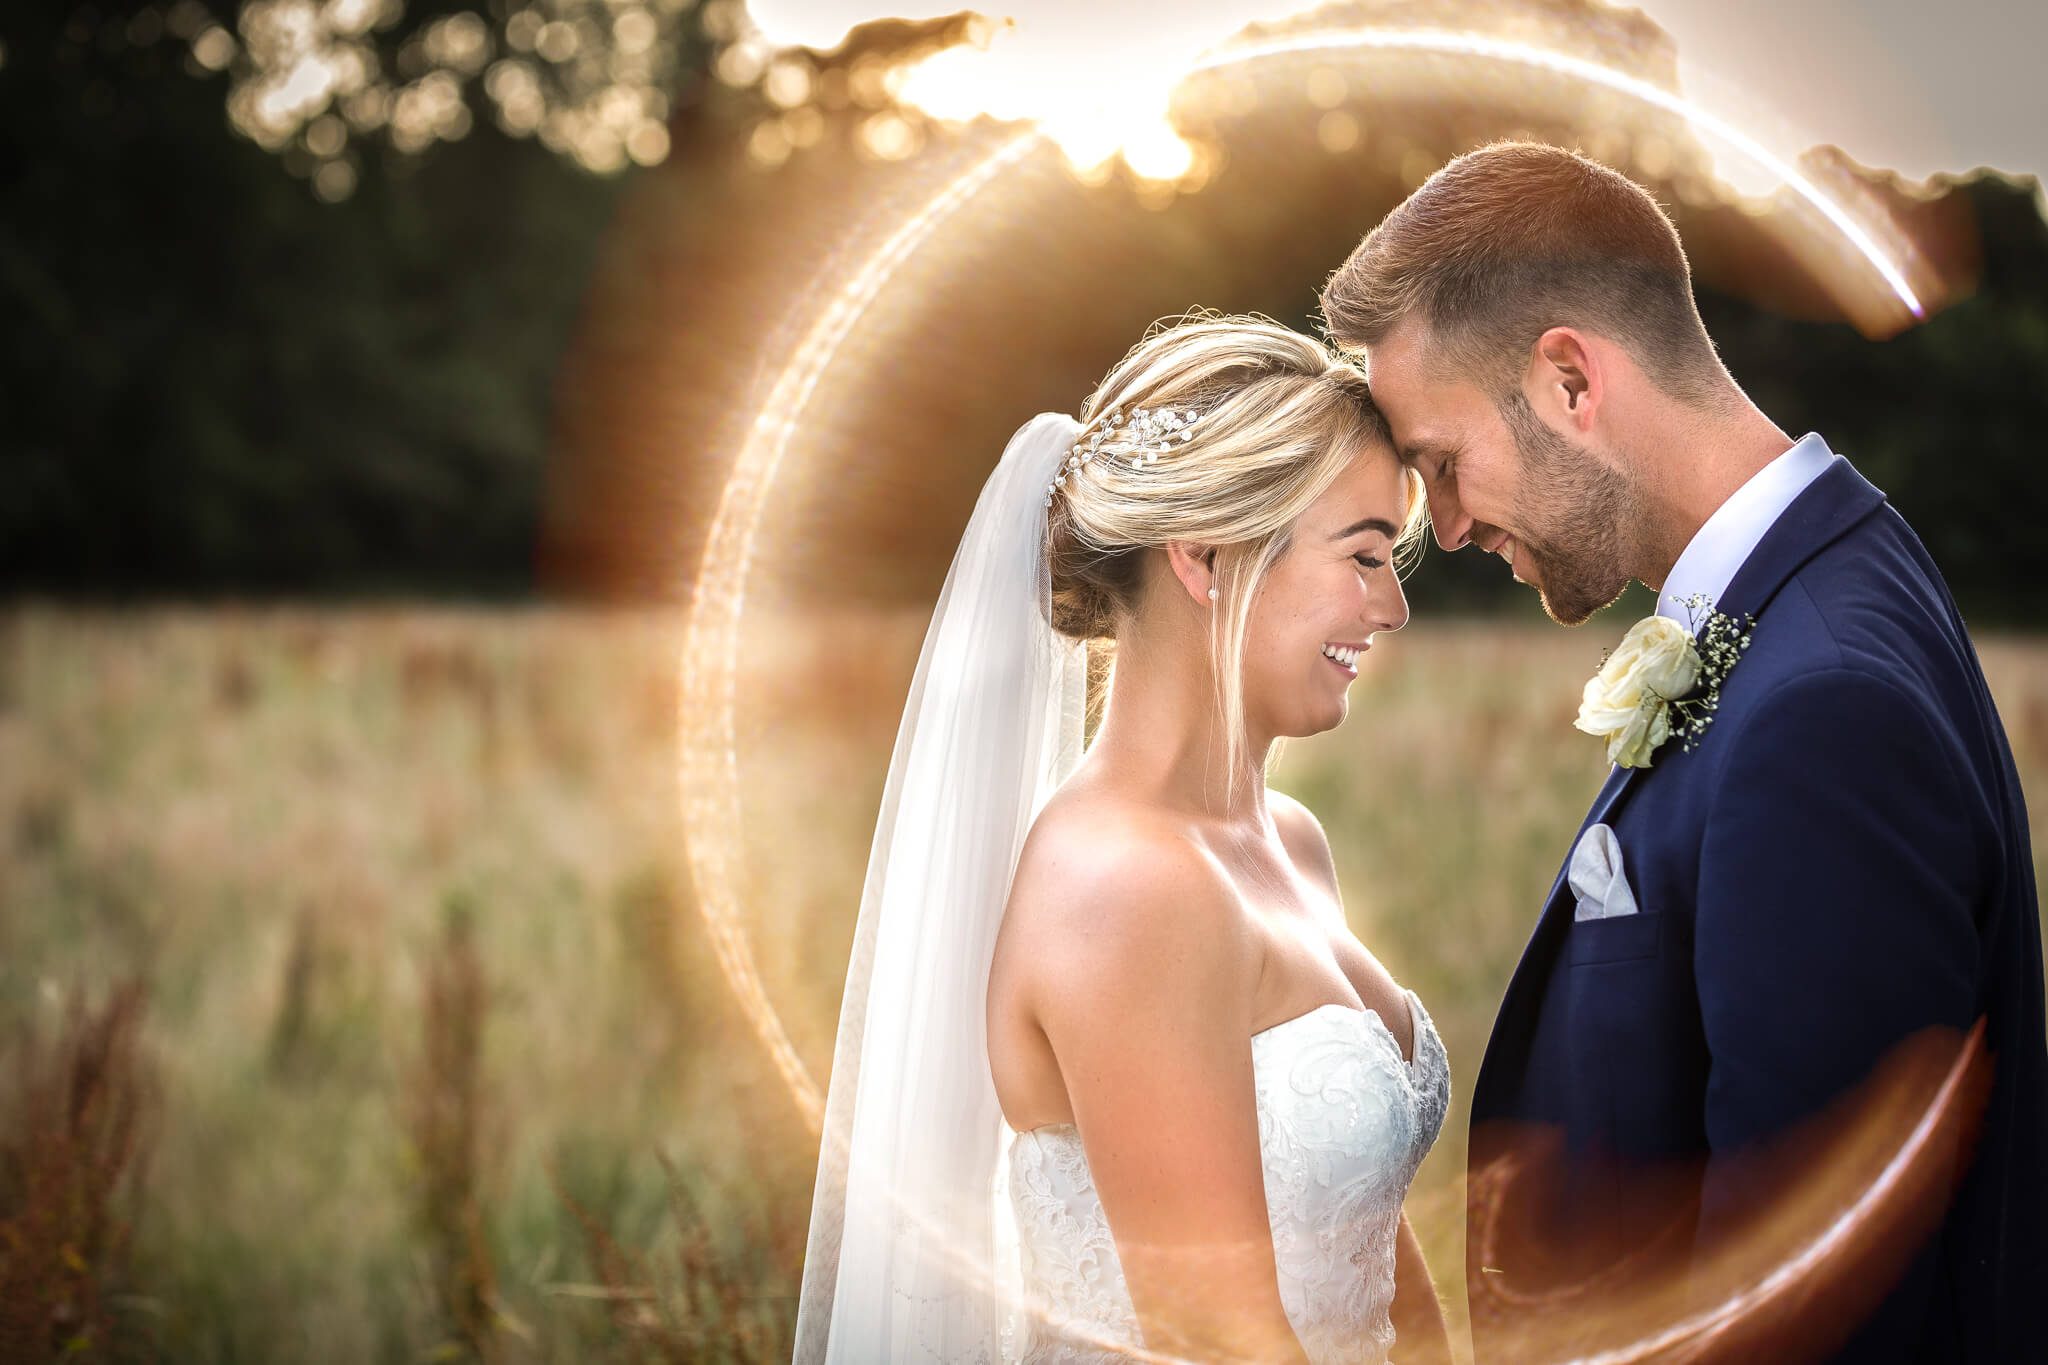 Berkshire-wedding-photographer-northbrook-park-surrey